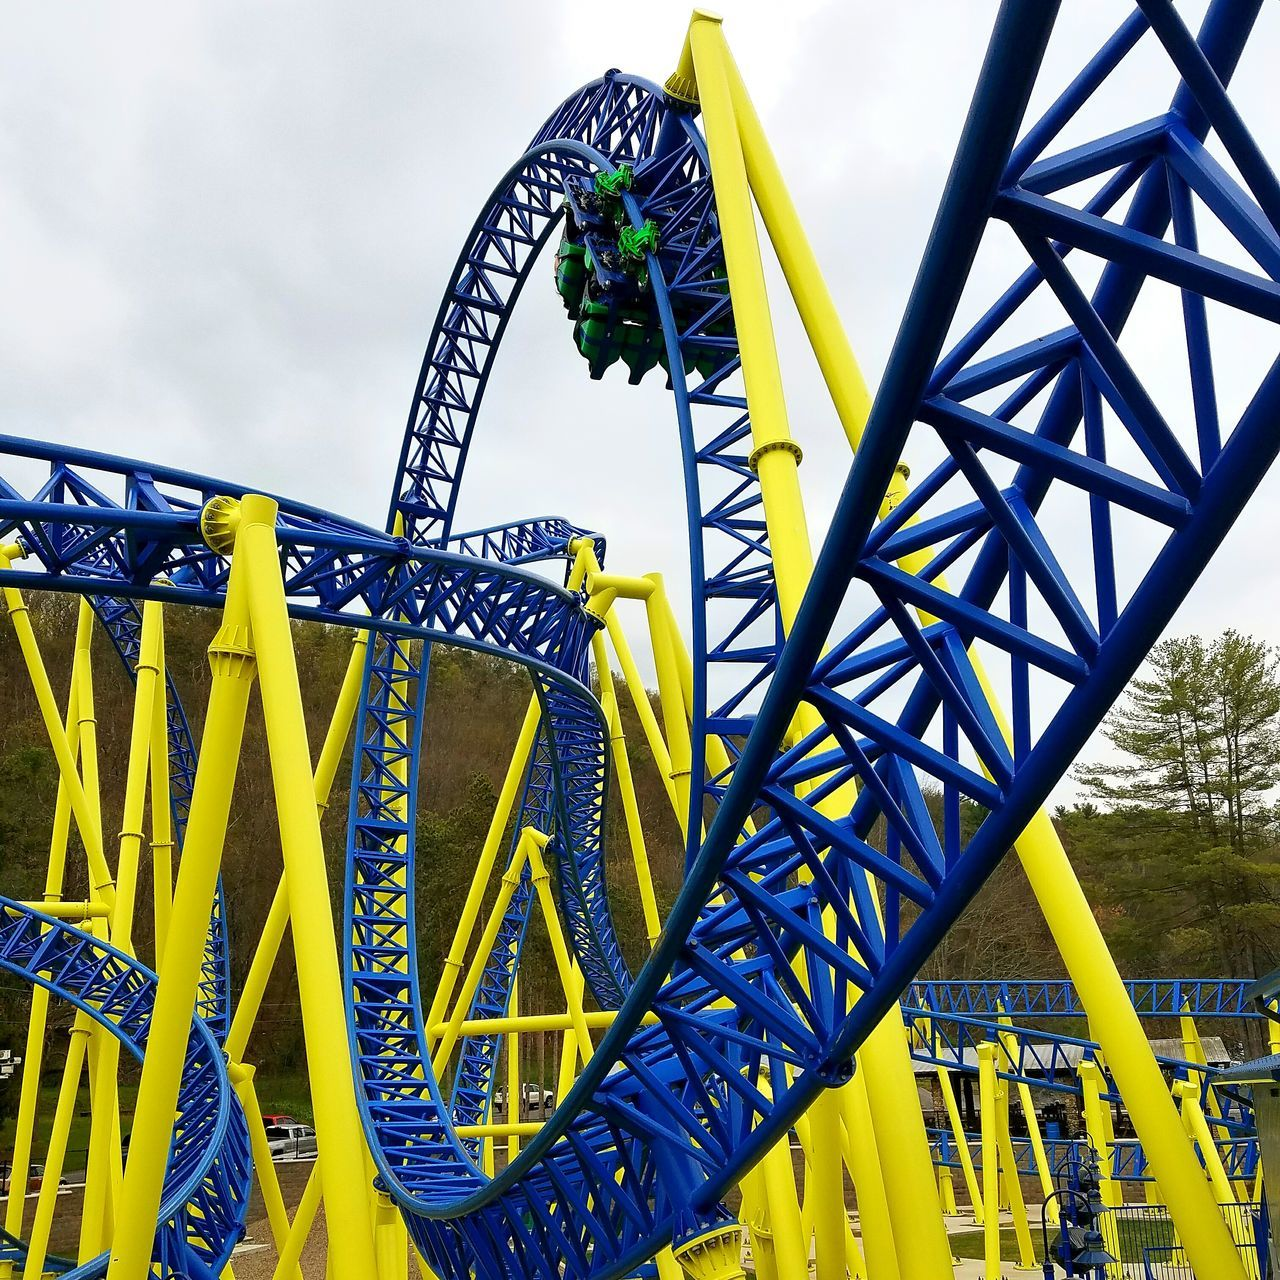 Impulse Impulse Knoebels Amusement Park Rollercoaster Fun Amusement Park Ride Sky Yellow Outdoors Steel Thrill Ride Theme Park EyeEmNewHere Rollercoaster Roller Coaster Pennsylvania Elysburg Maurer Söhne Inverting Looping Loop